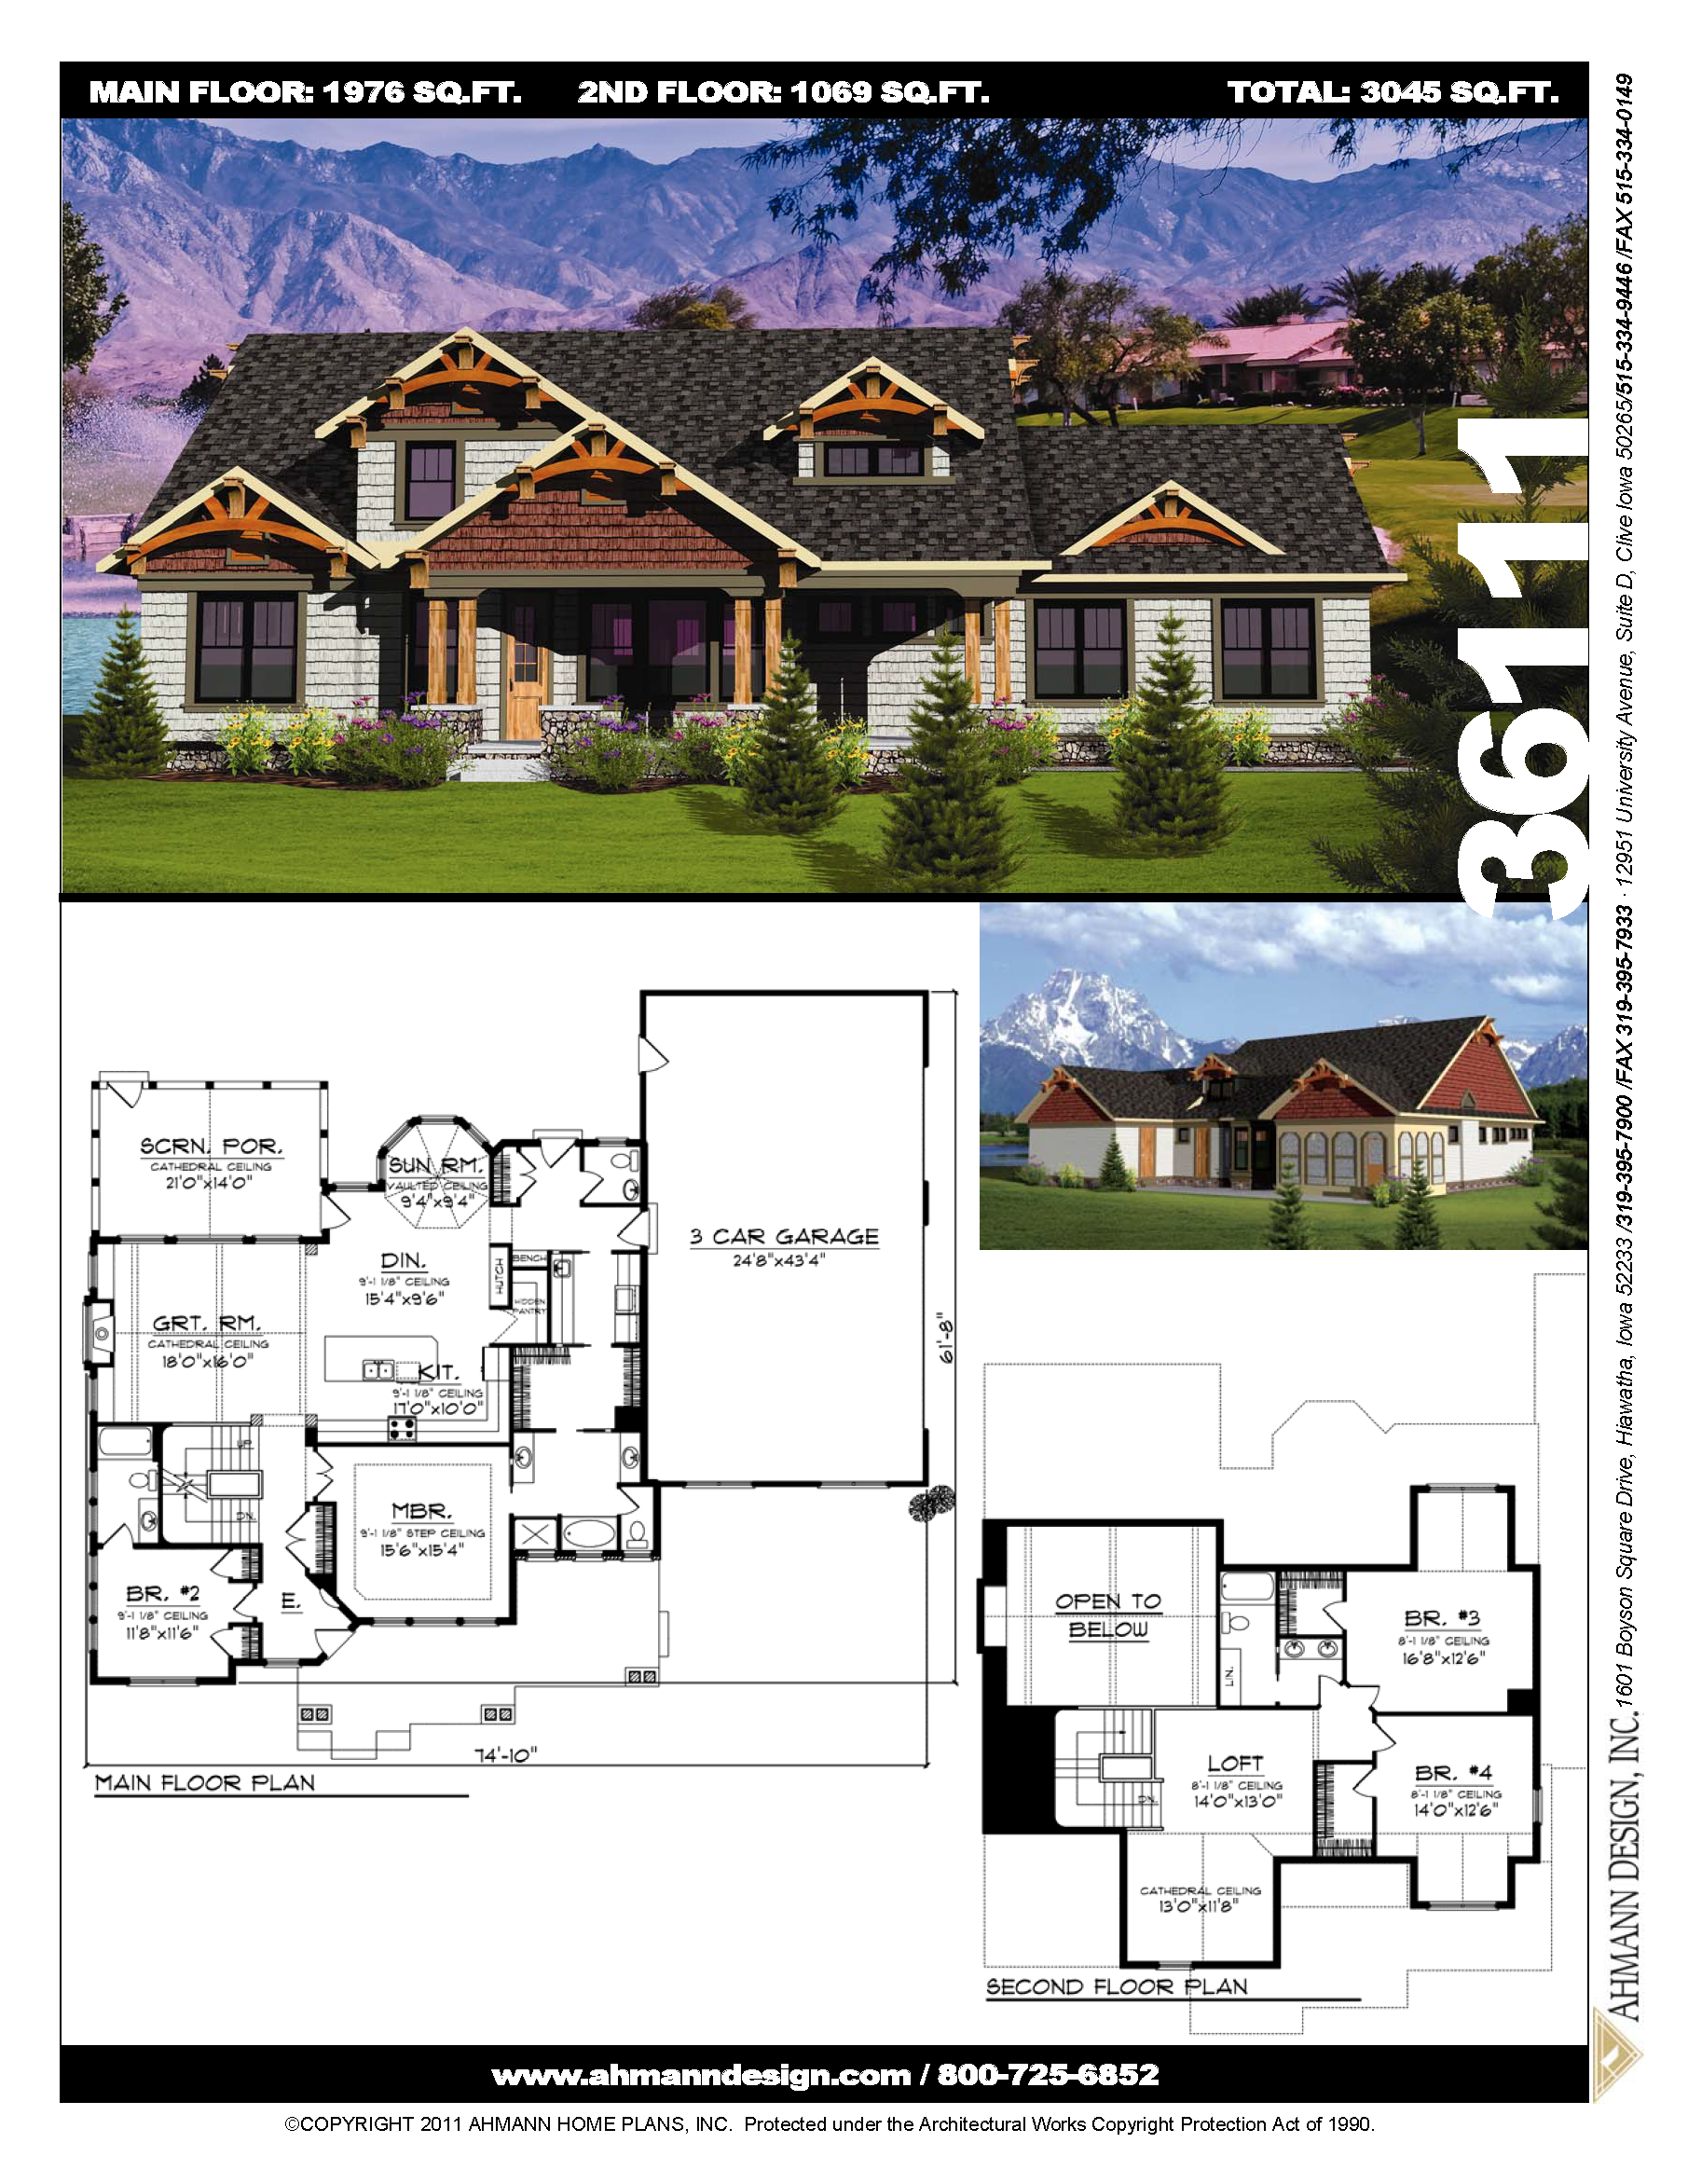 36111 Contemporary House Plans House Plans Wood Plans